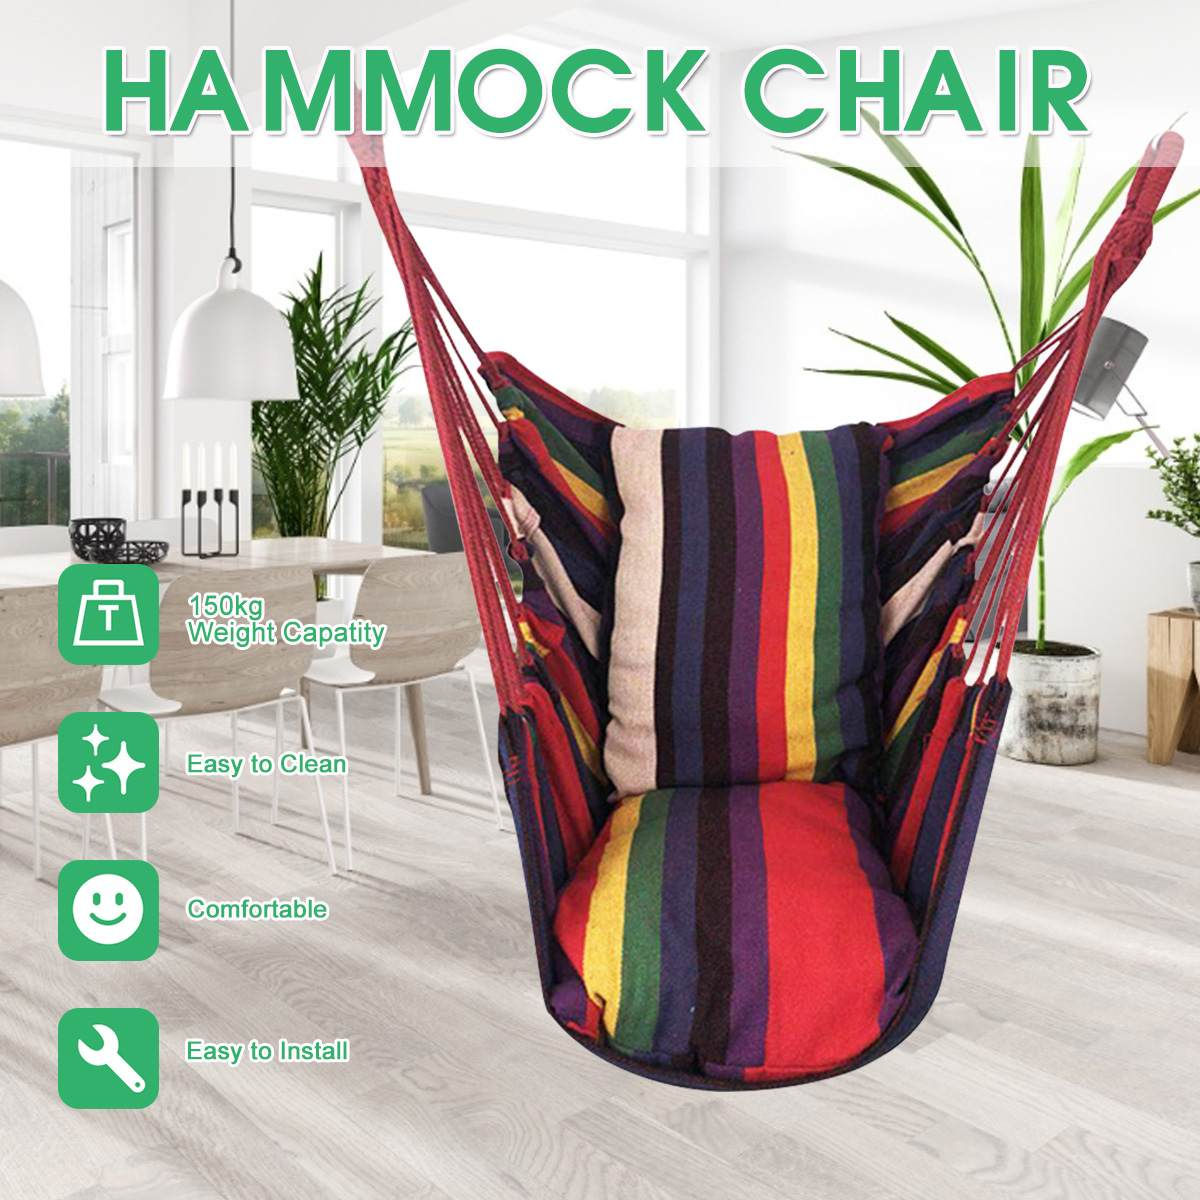 Portable Swing Seat Hammock Chair Swing Chair Patio Swing Outdoor Garden Hanging Chair Travel Camping Hammock Silla Colgante